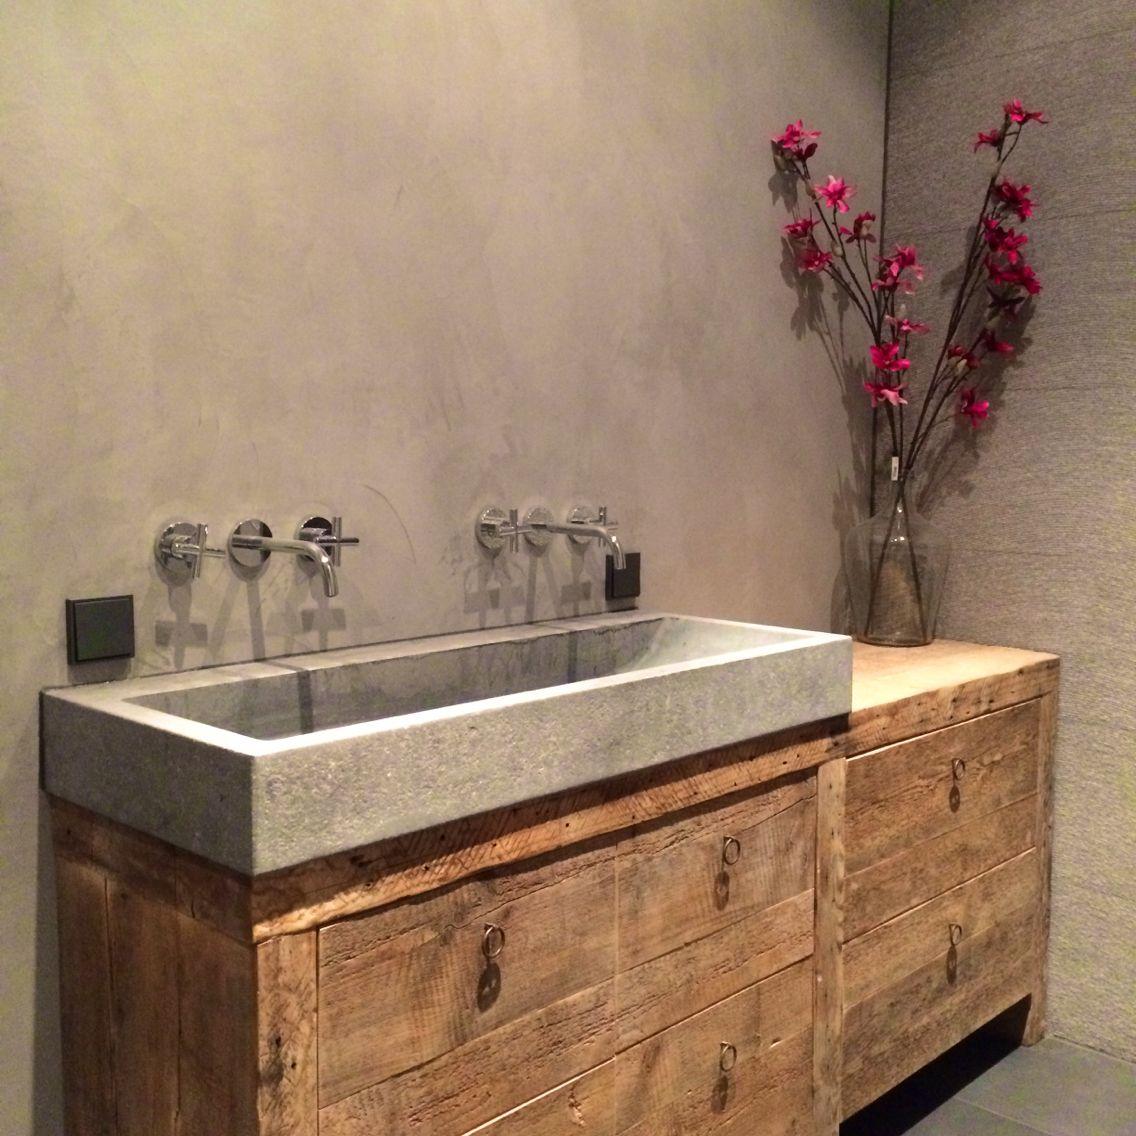 badkamer badmeubel hout oude bouwmaterialen flowers